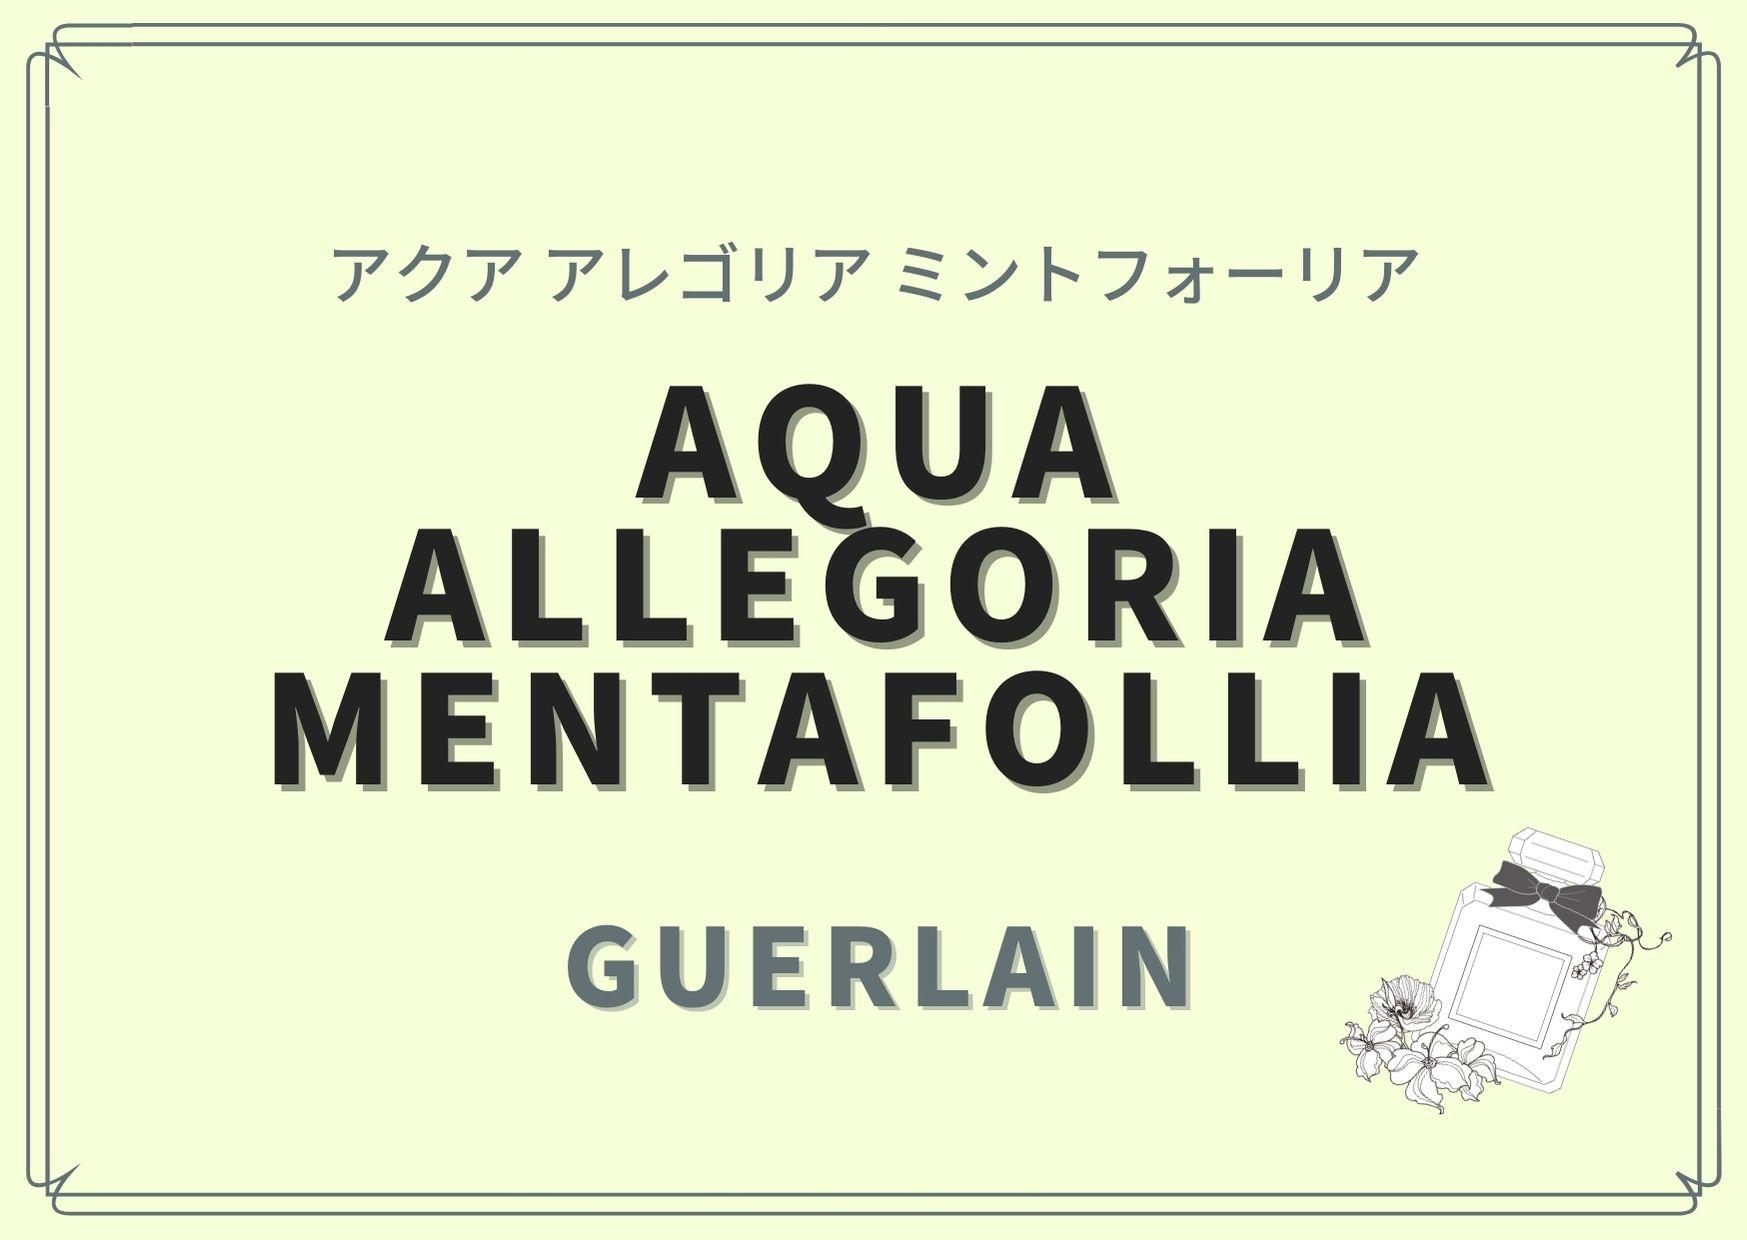 Aqua Allegoria Mentafollia(アクア アレゴリア ミントフォーリア)/GUERLAIN(ゲラン)